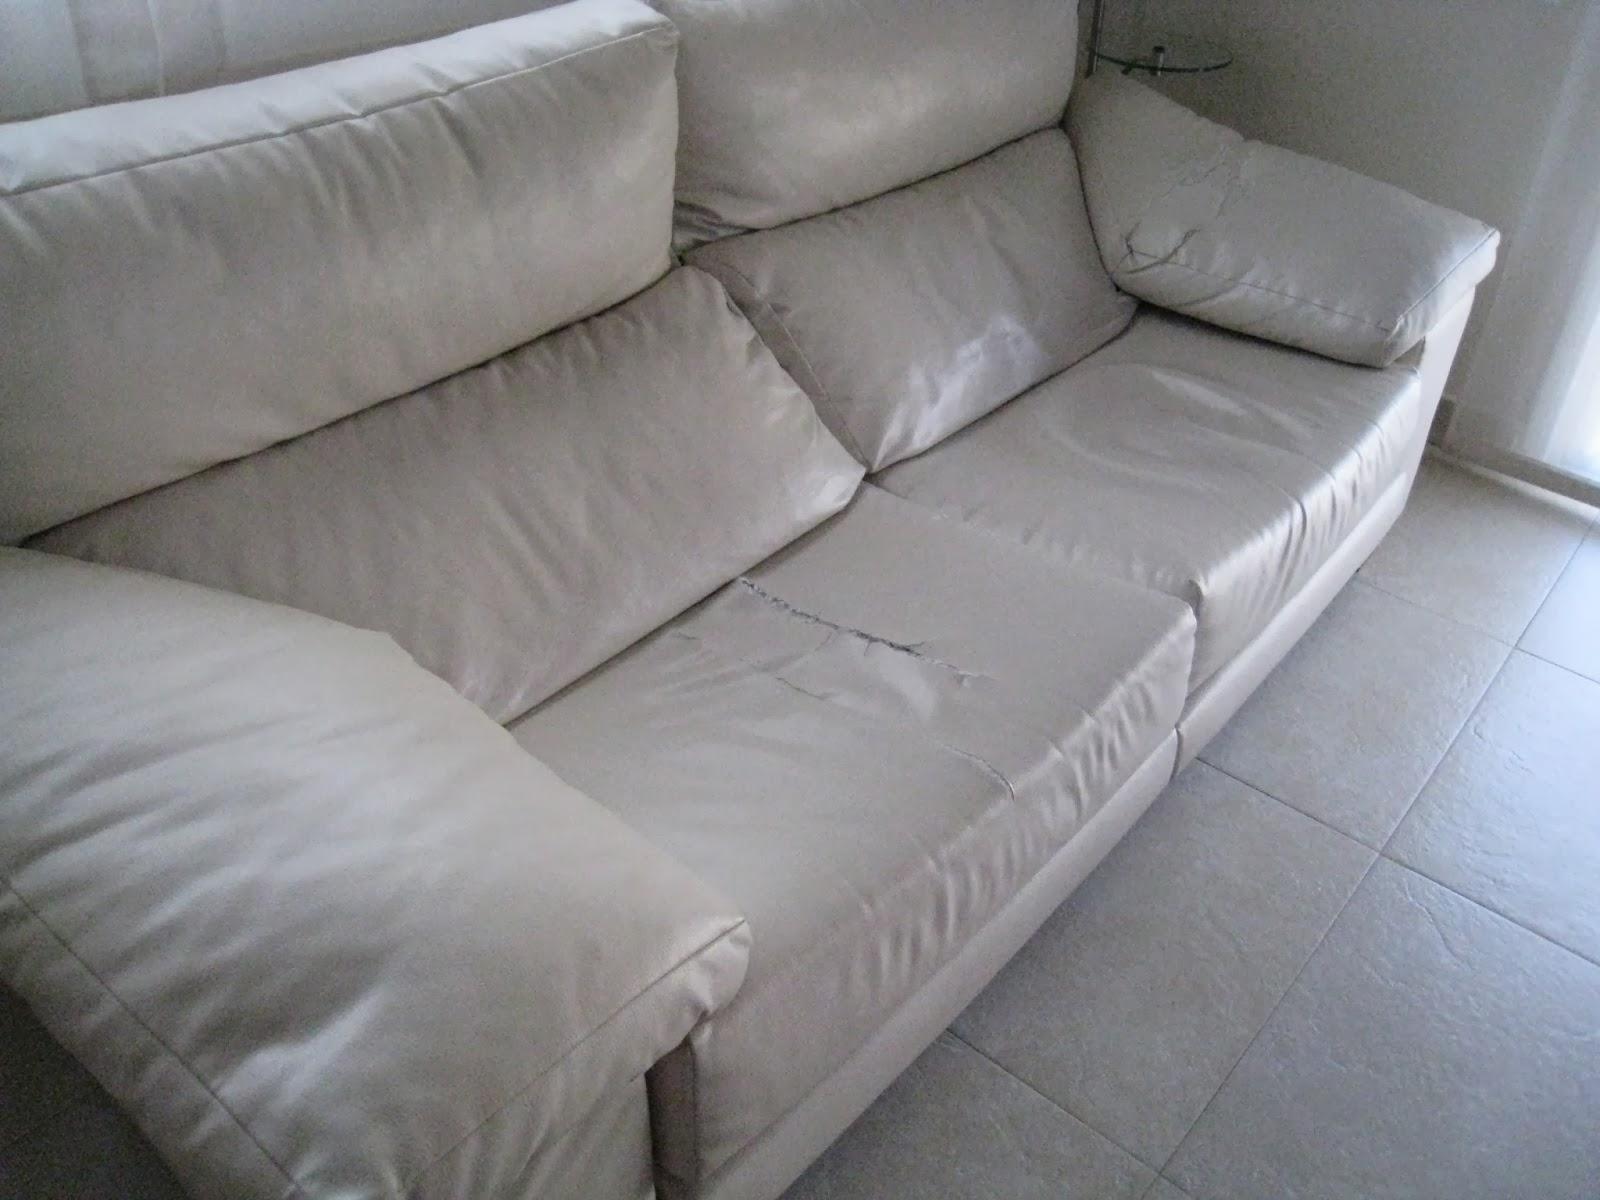 fundas para sofas en lugo camas modernos madrid de sofá a la carta piel o poli daÑada  funda